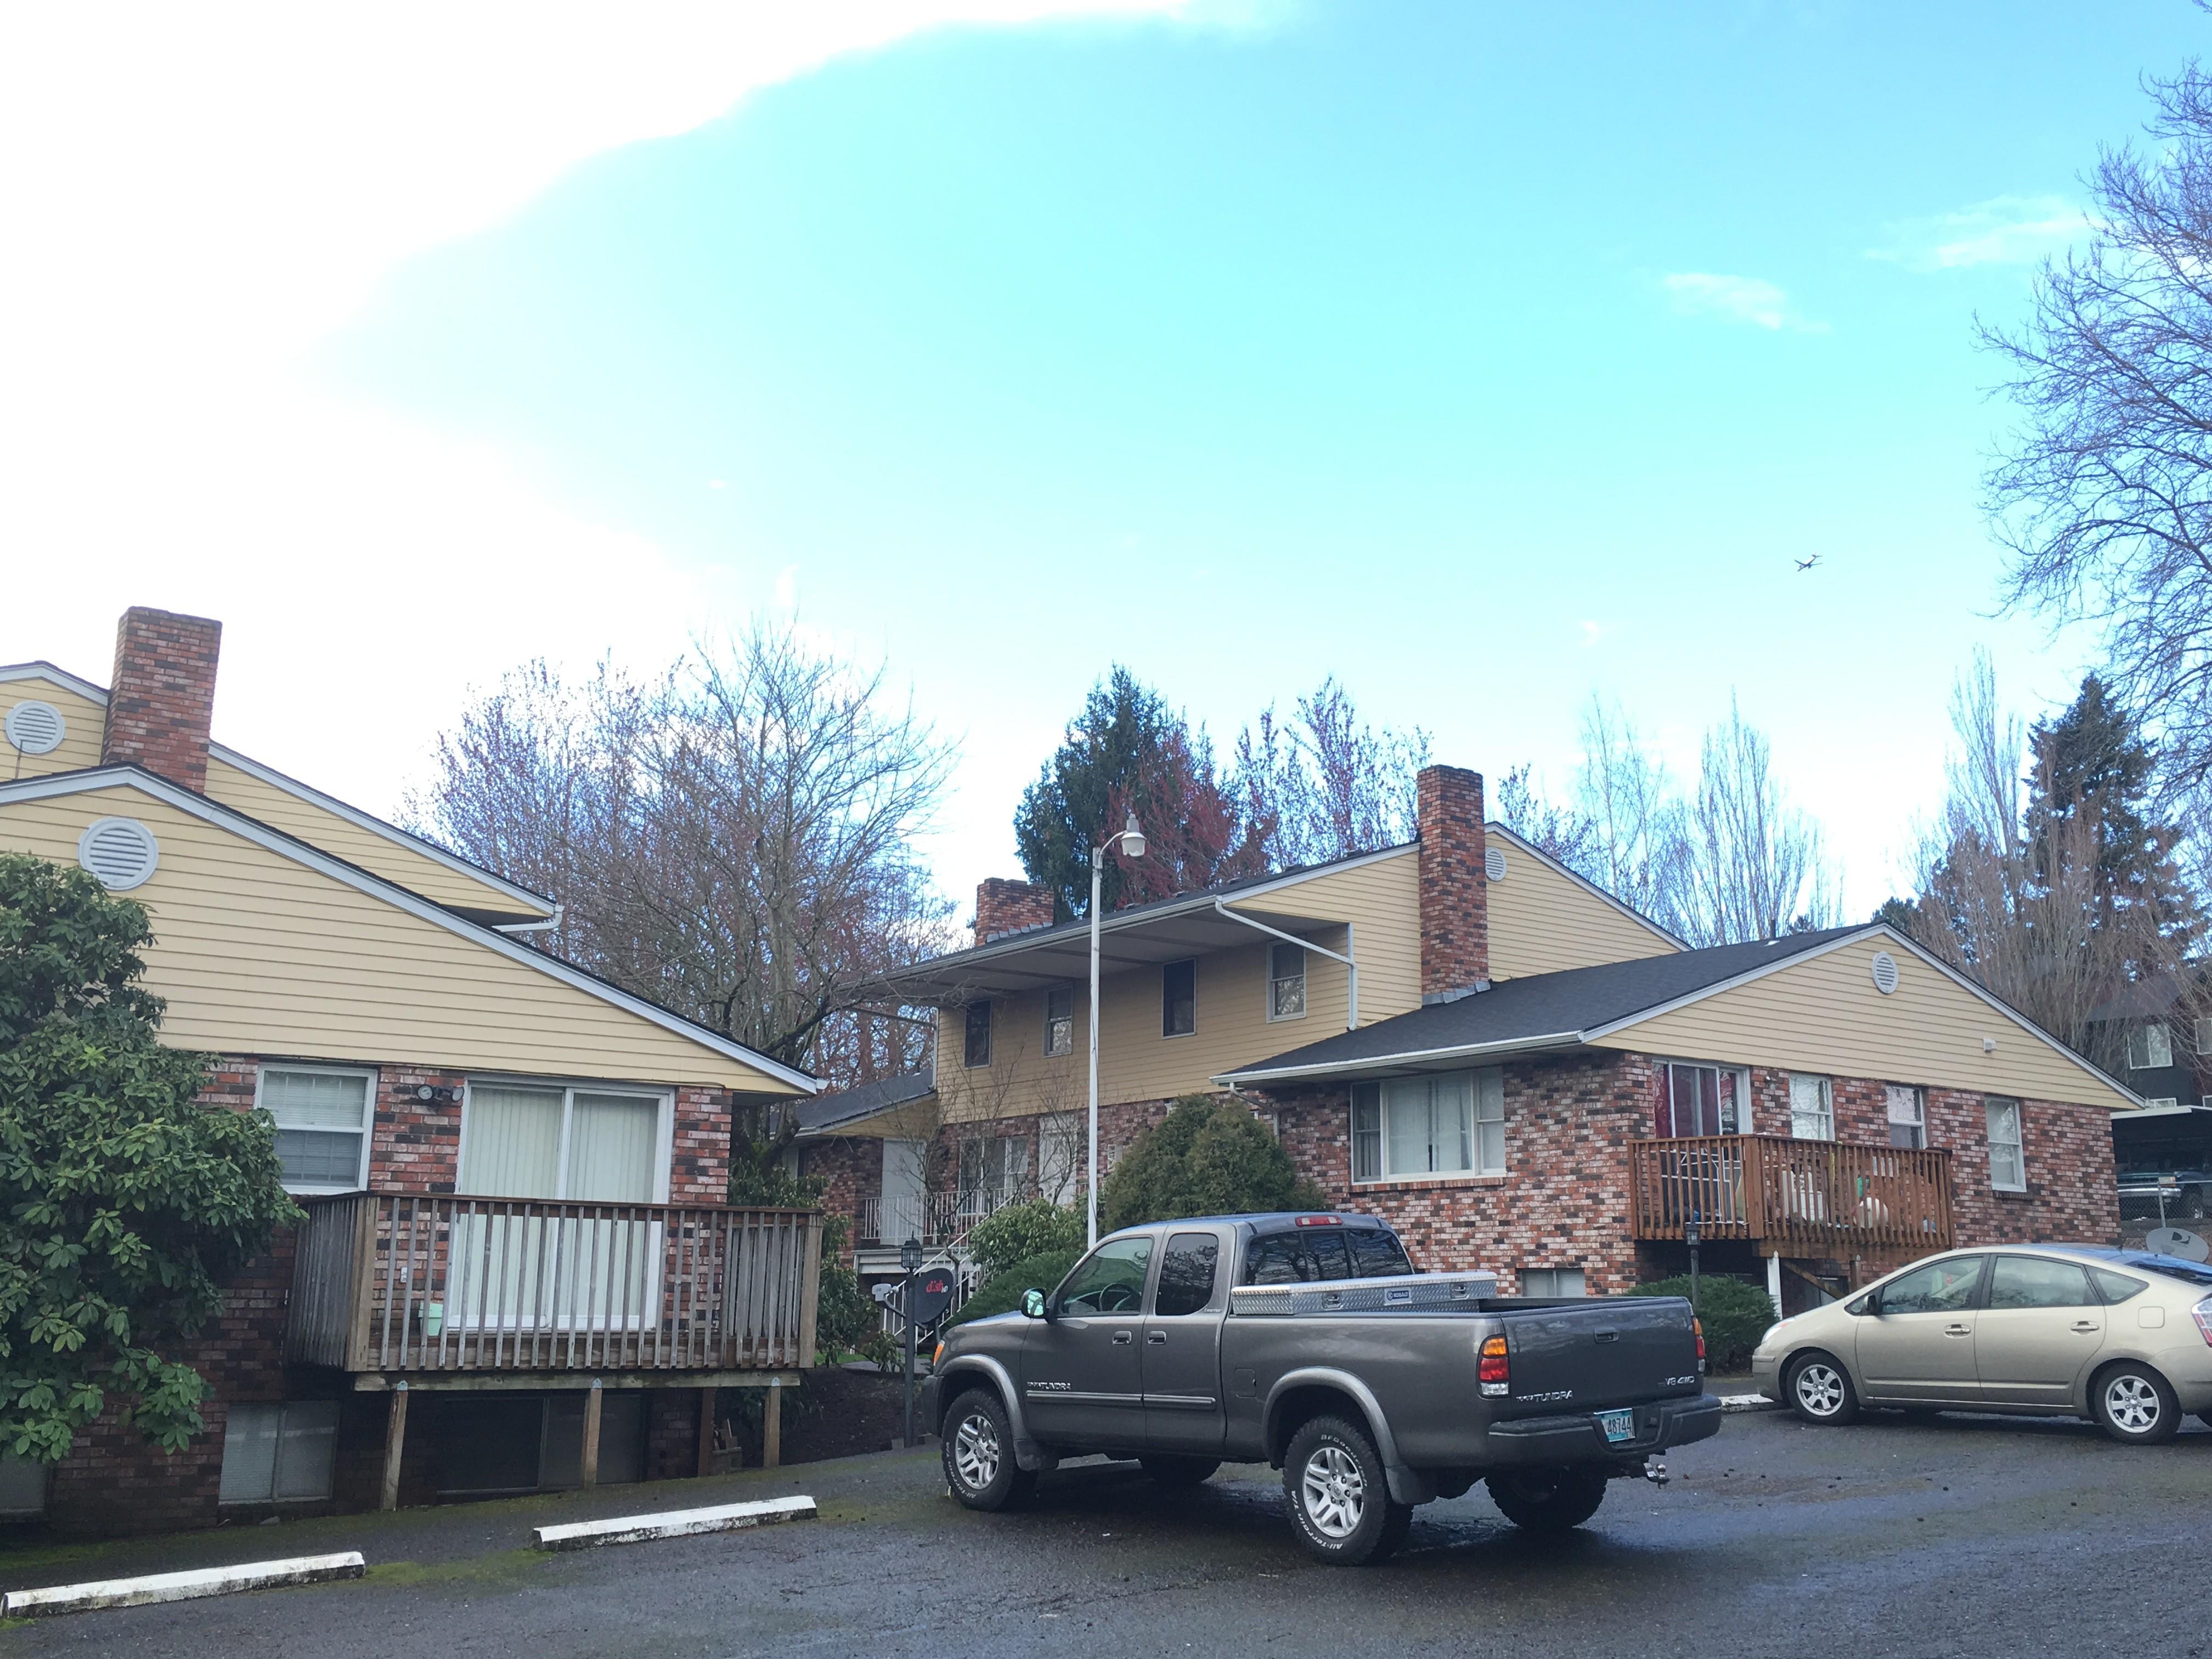 SOLD! 13 Units, Gresham, Oregon:  $1,300,000